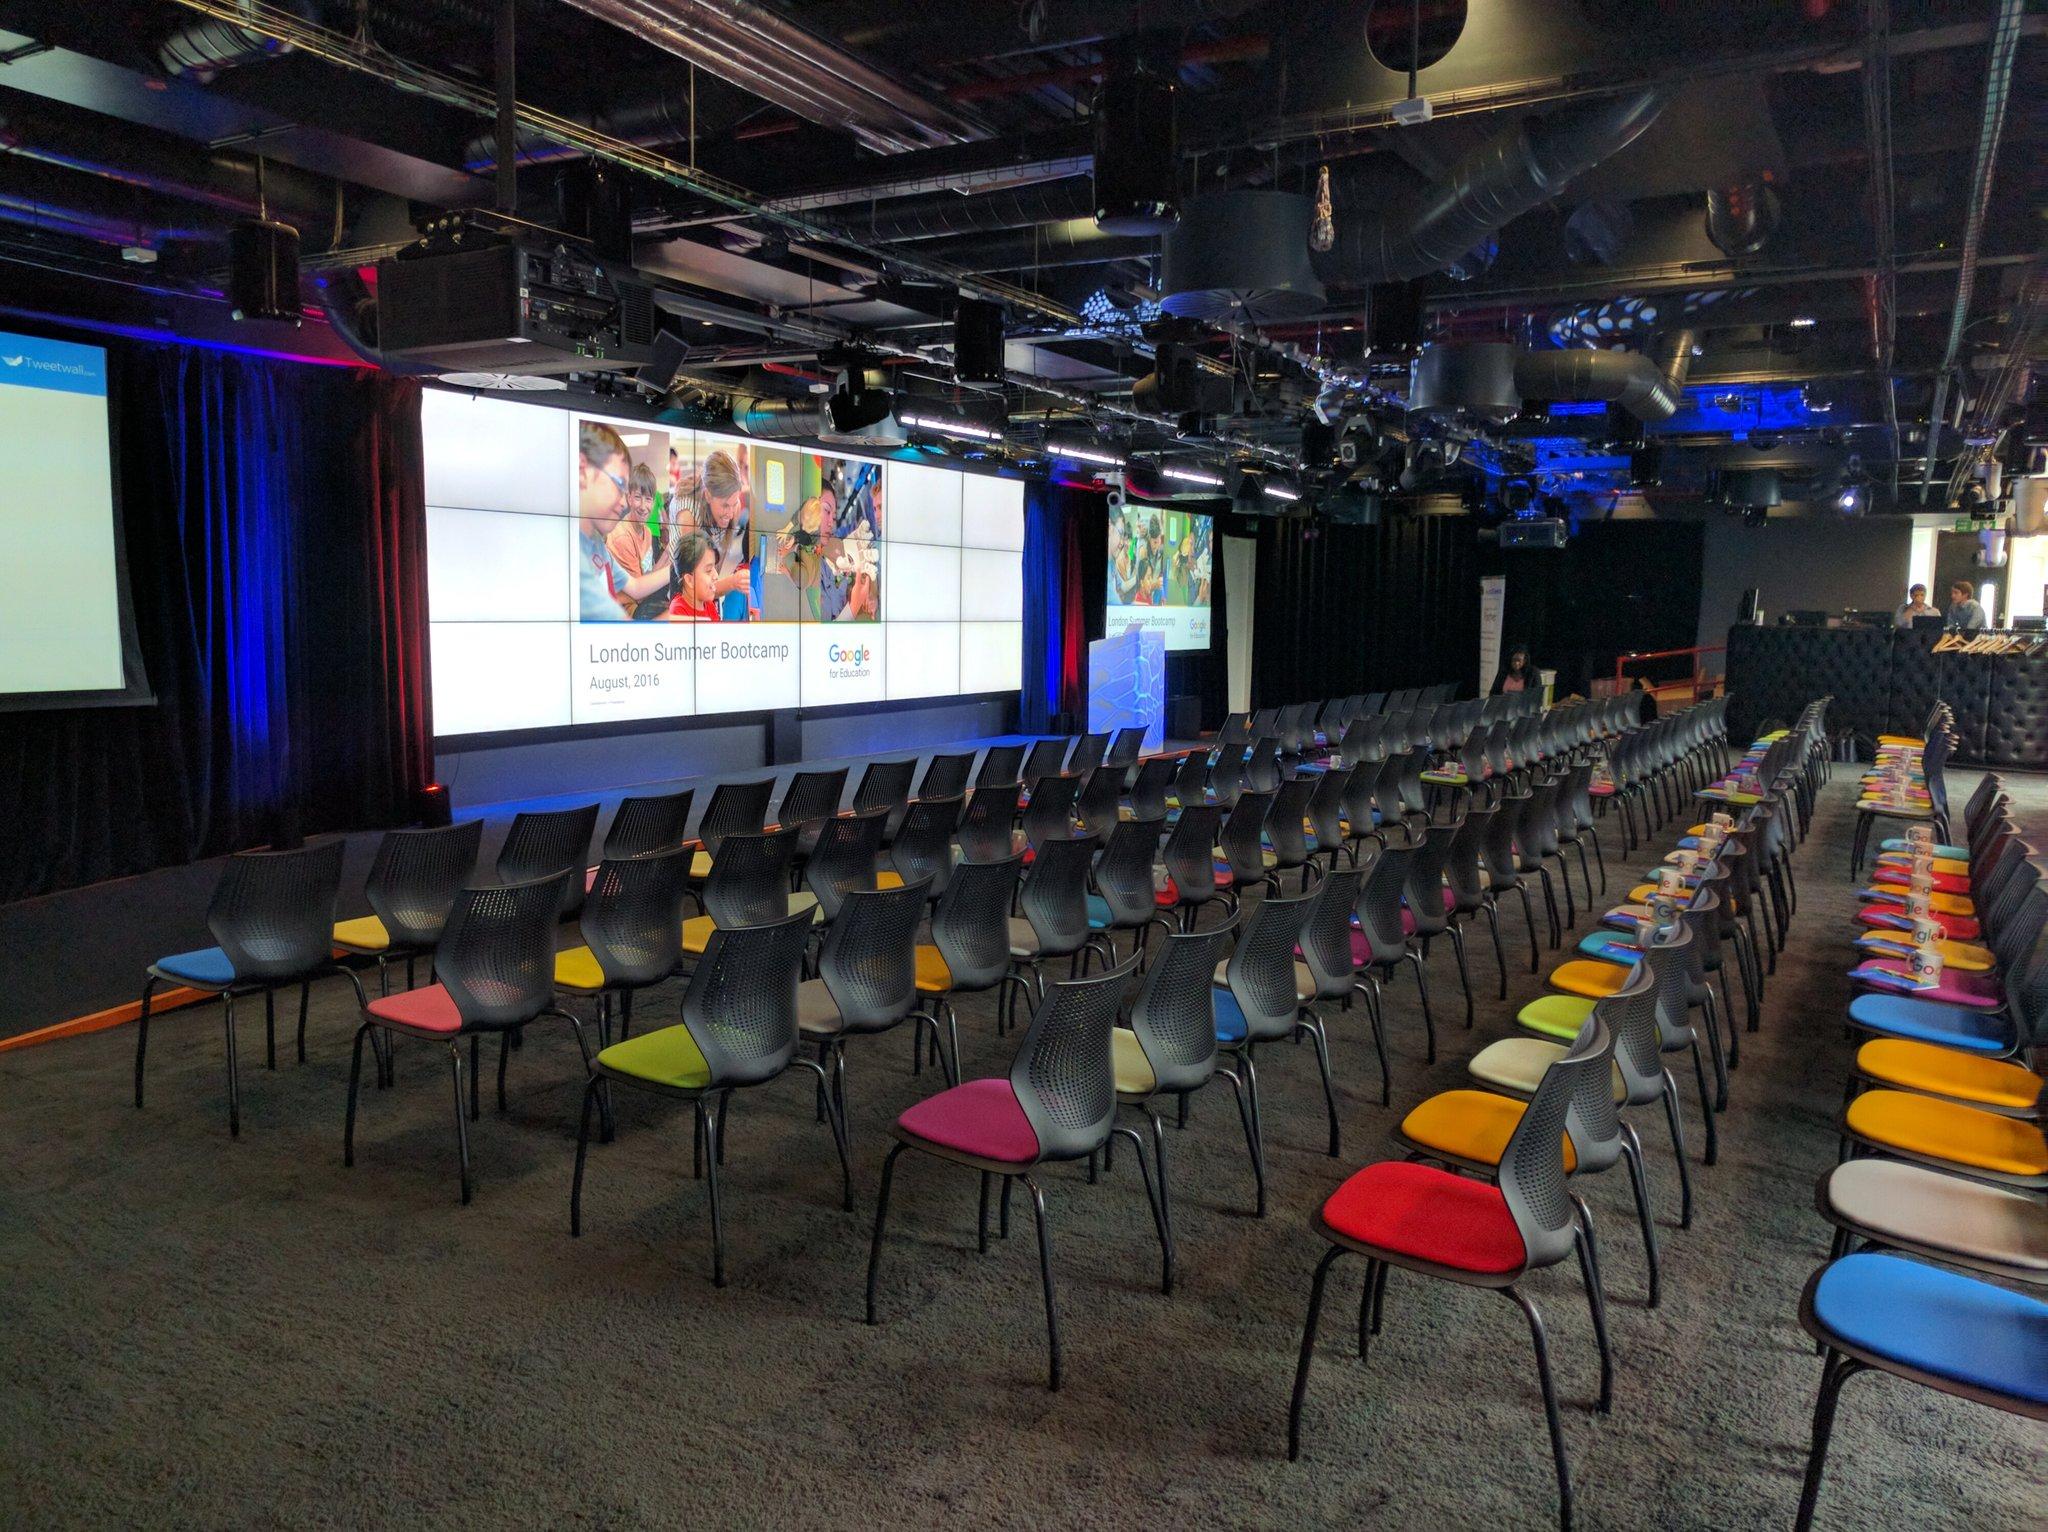 The calm before the #edtech...#edubootcamp16 #GoogleEDU https://t.co/uVcG9mTLuc